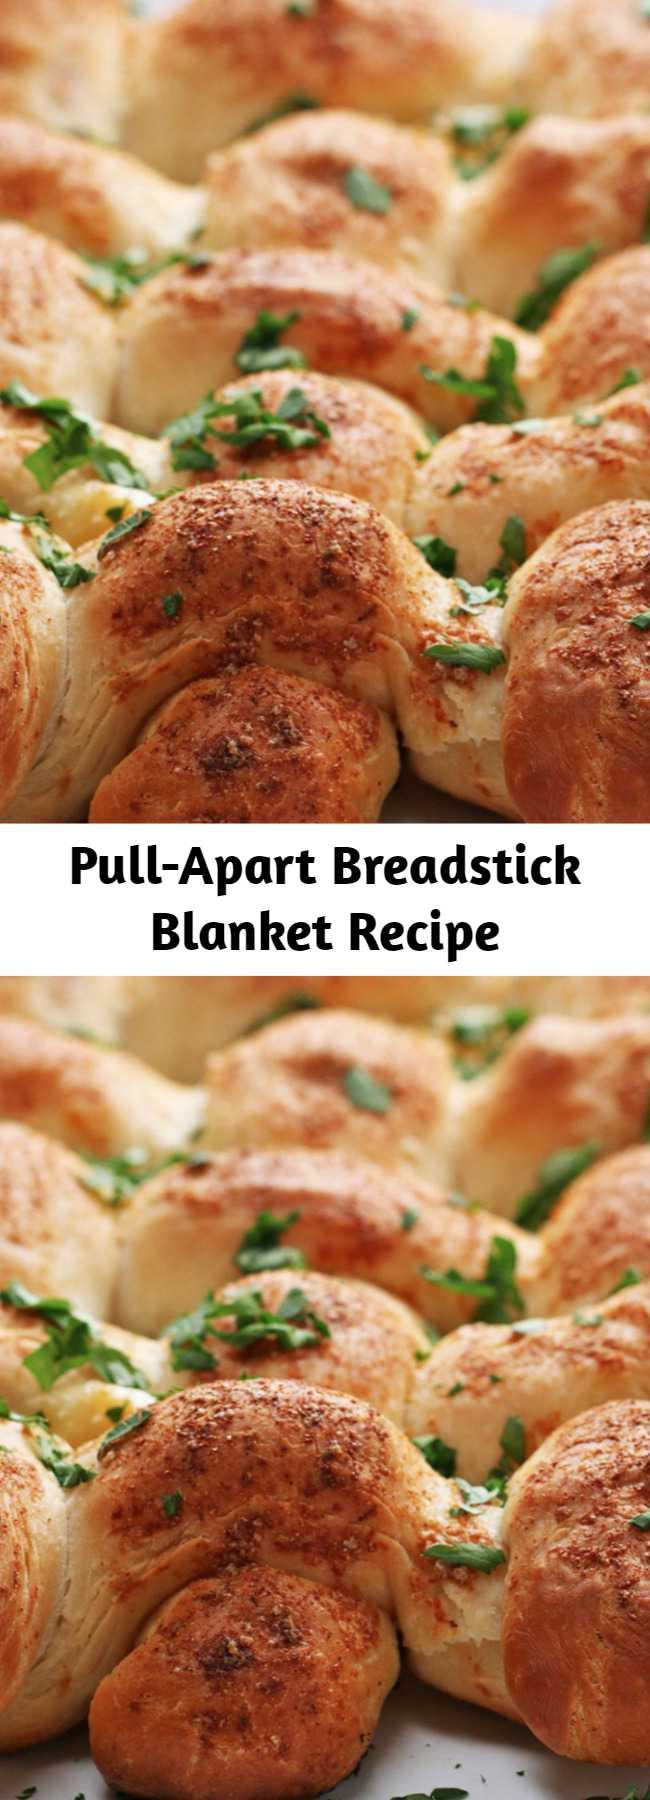 Pull-Apart Breadstick Blanket Recipe